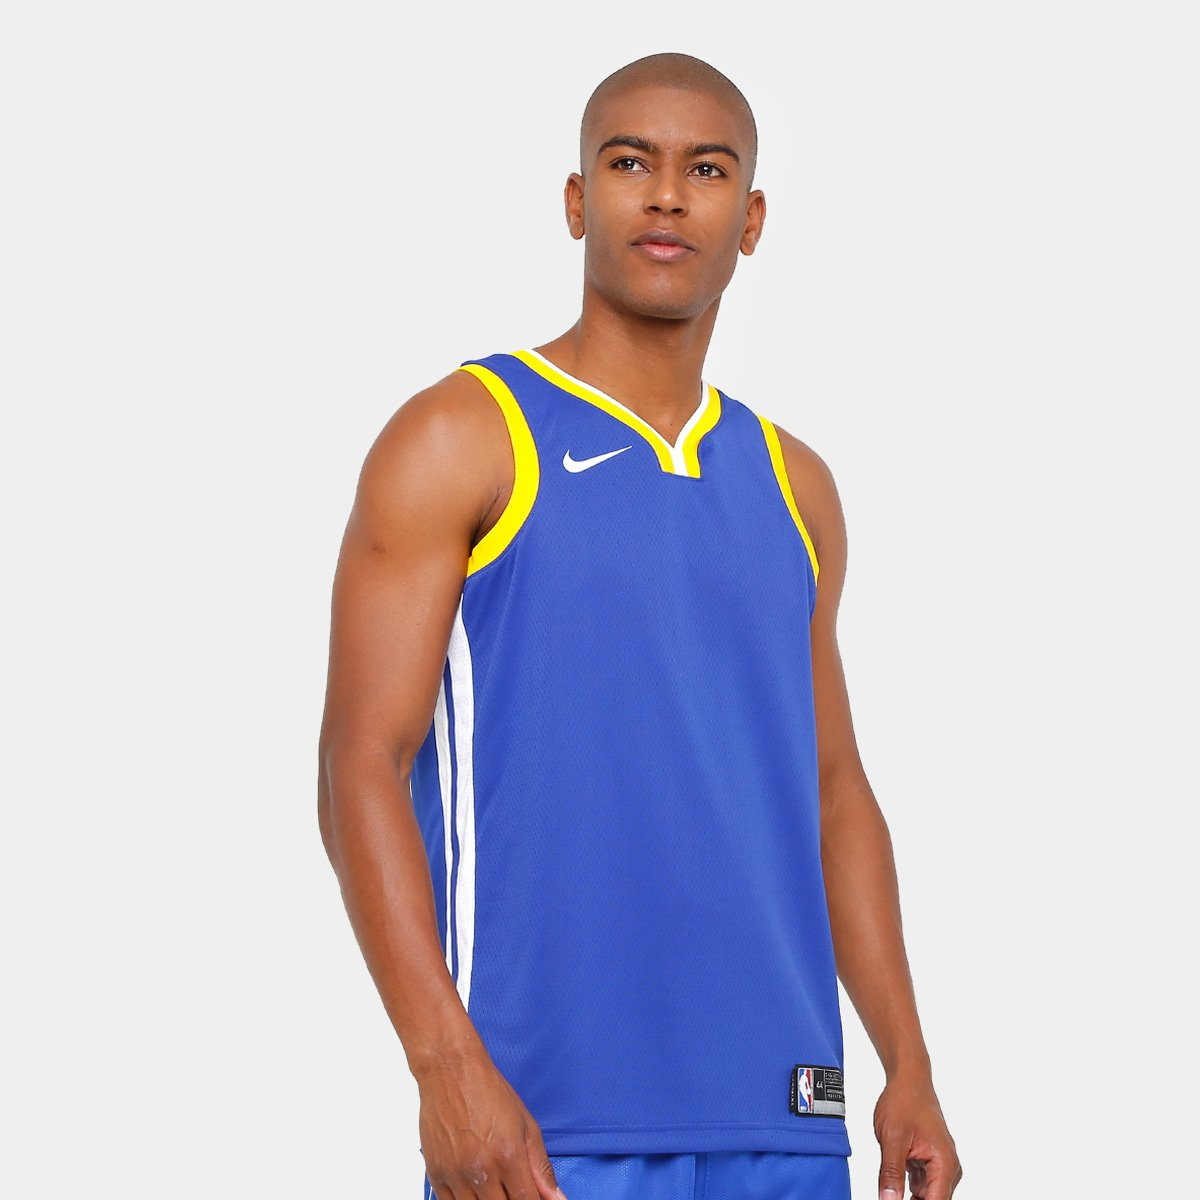 f66b600f0022b Camisa Regata Nike Golden State Warriors Swingman Road NBA | Loja NBA